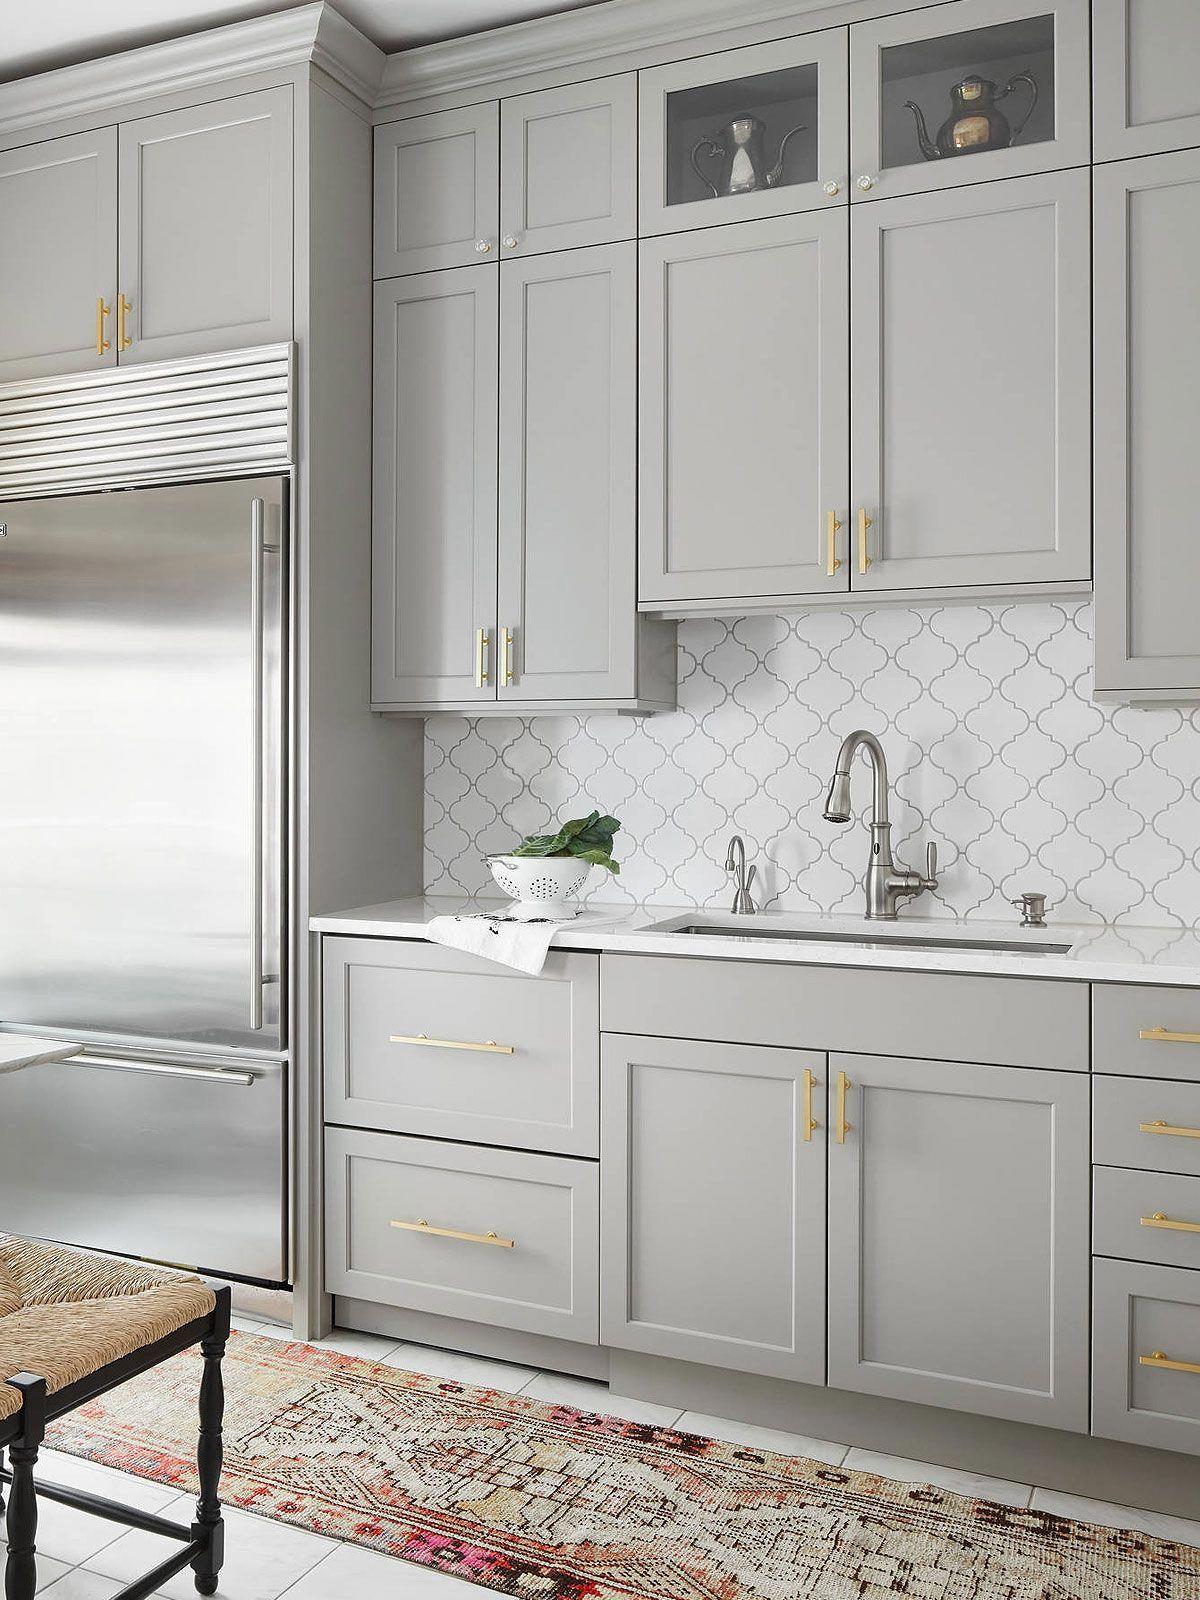 White Glazed Porcelain Arabesque Backsplash Tile Backsplash Com In 2020 Modern Kitchen Kitchen Layout Home Decor Kitchen